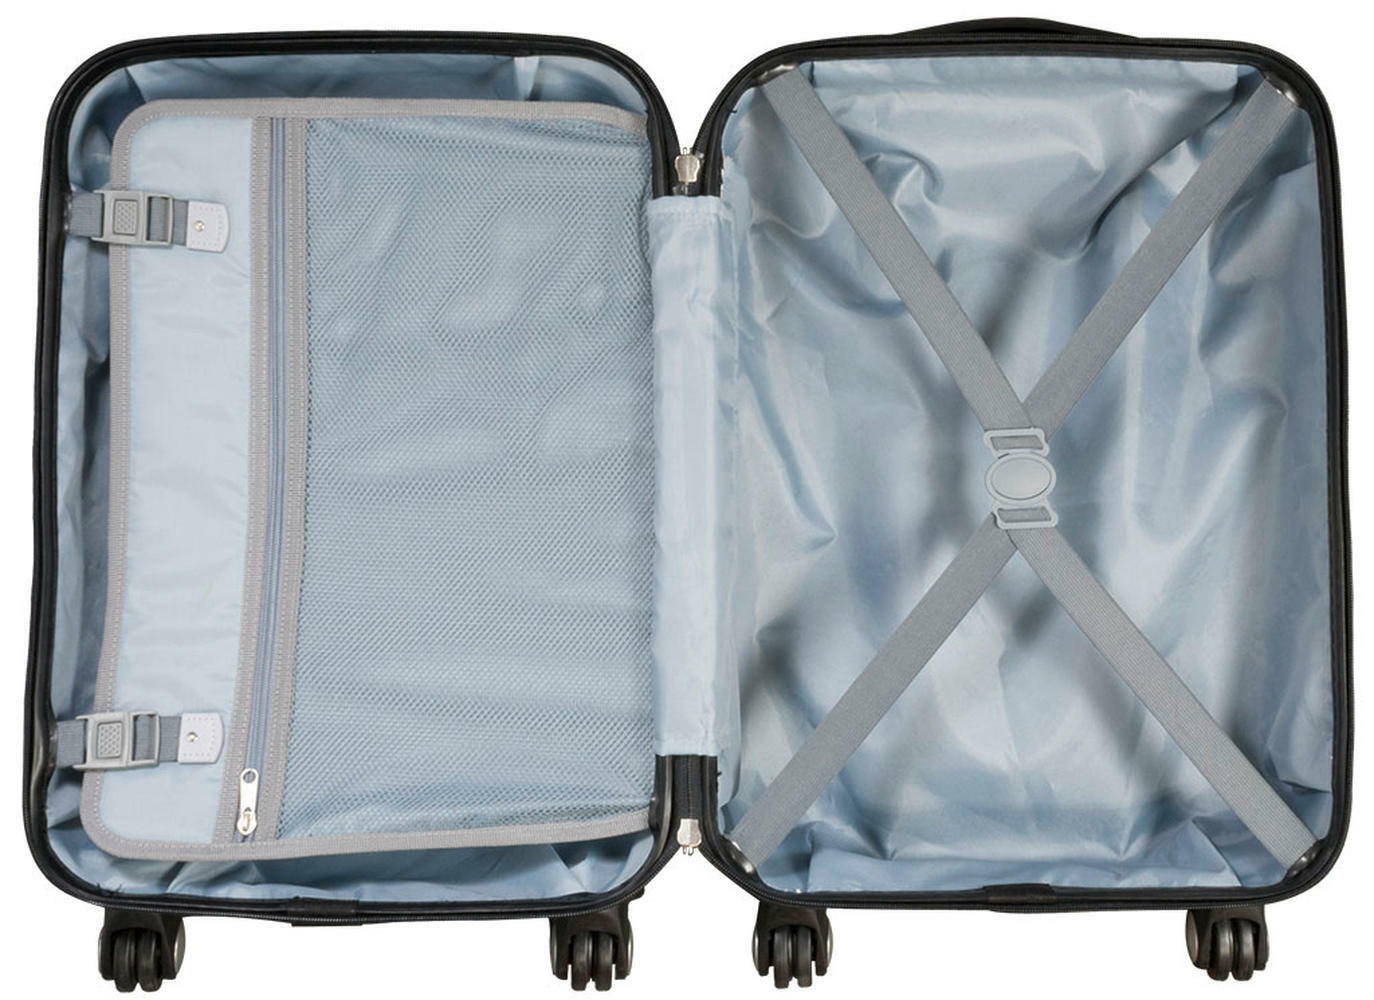 Coque rigide valise debout rouleau motif retro vintage Hawaii Hawaii Hawaii tiki style taille L 6cc242